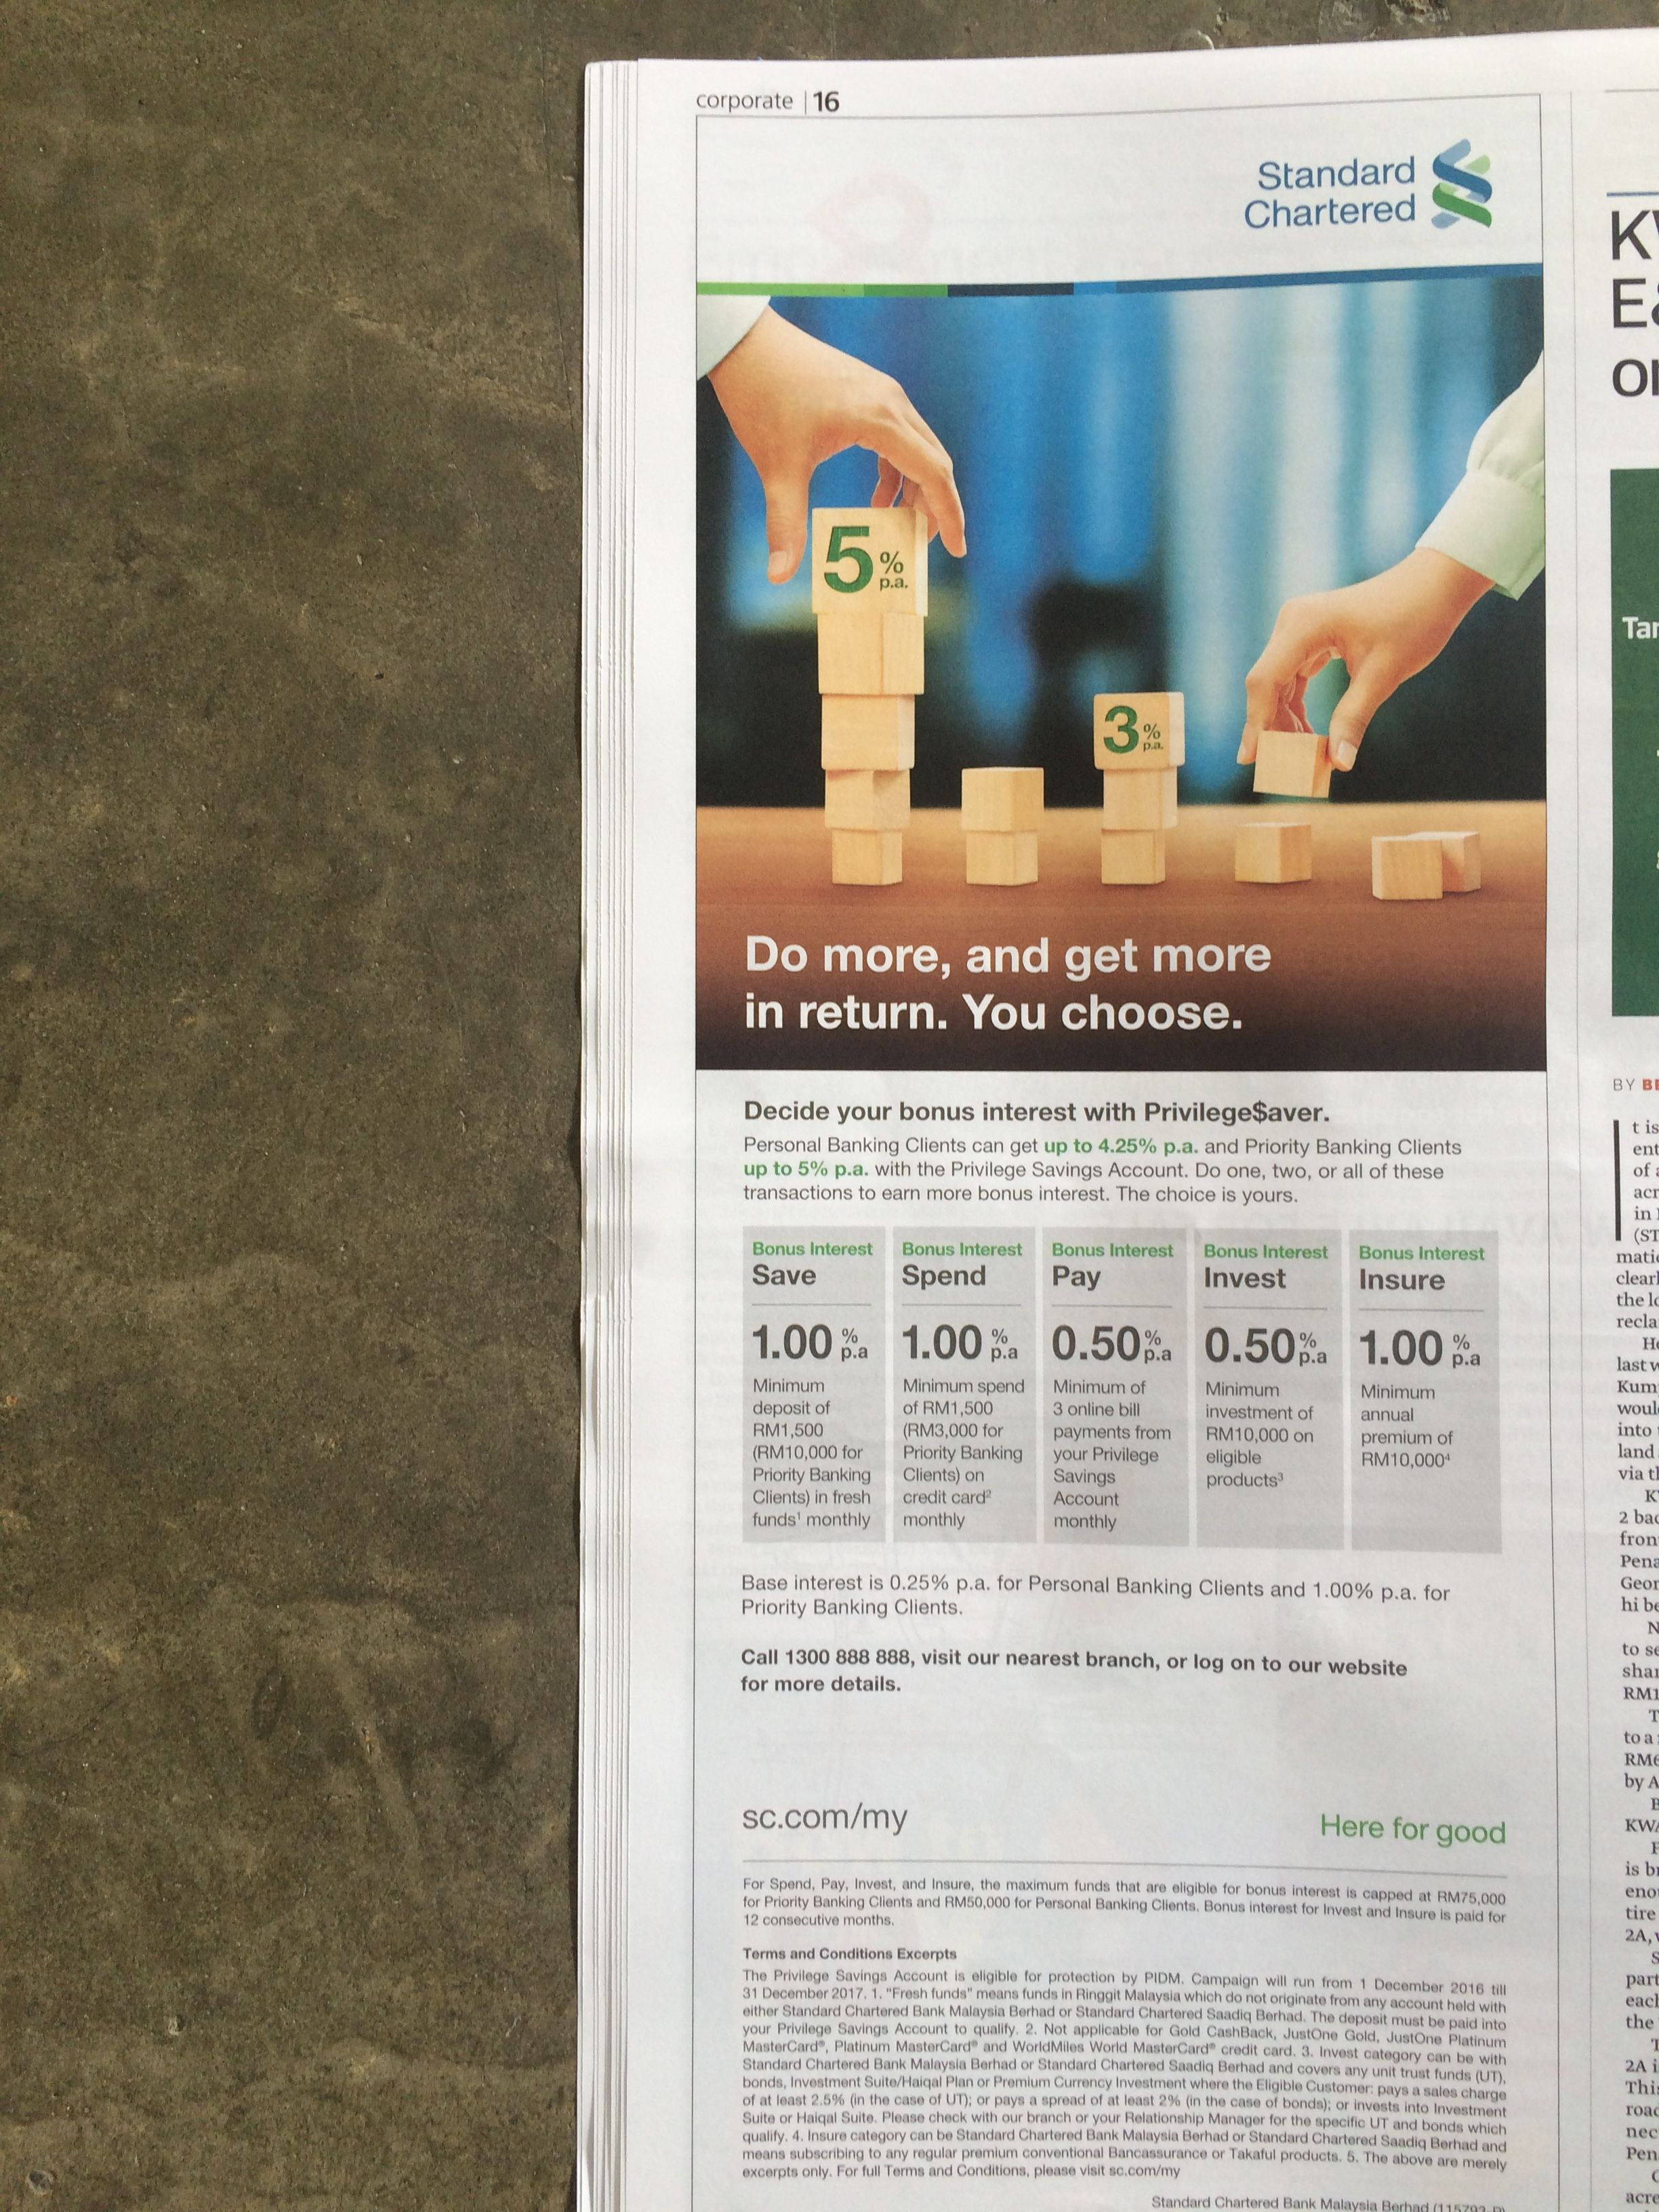 Standard Chartered Malaysia Ads Bank Banks Ads Personalized Bank Savings Account